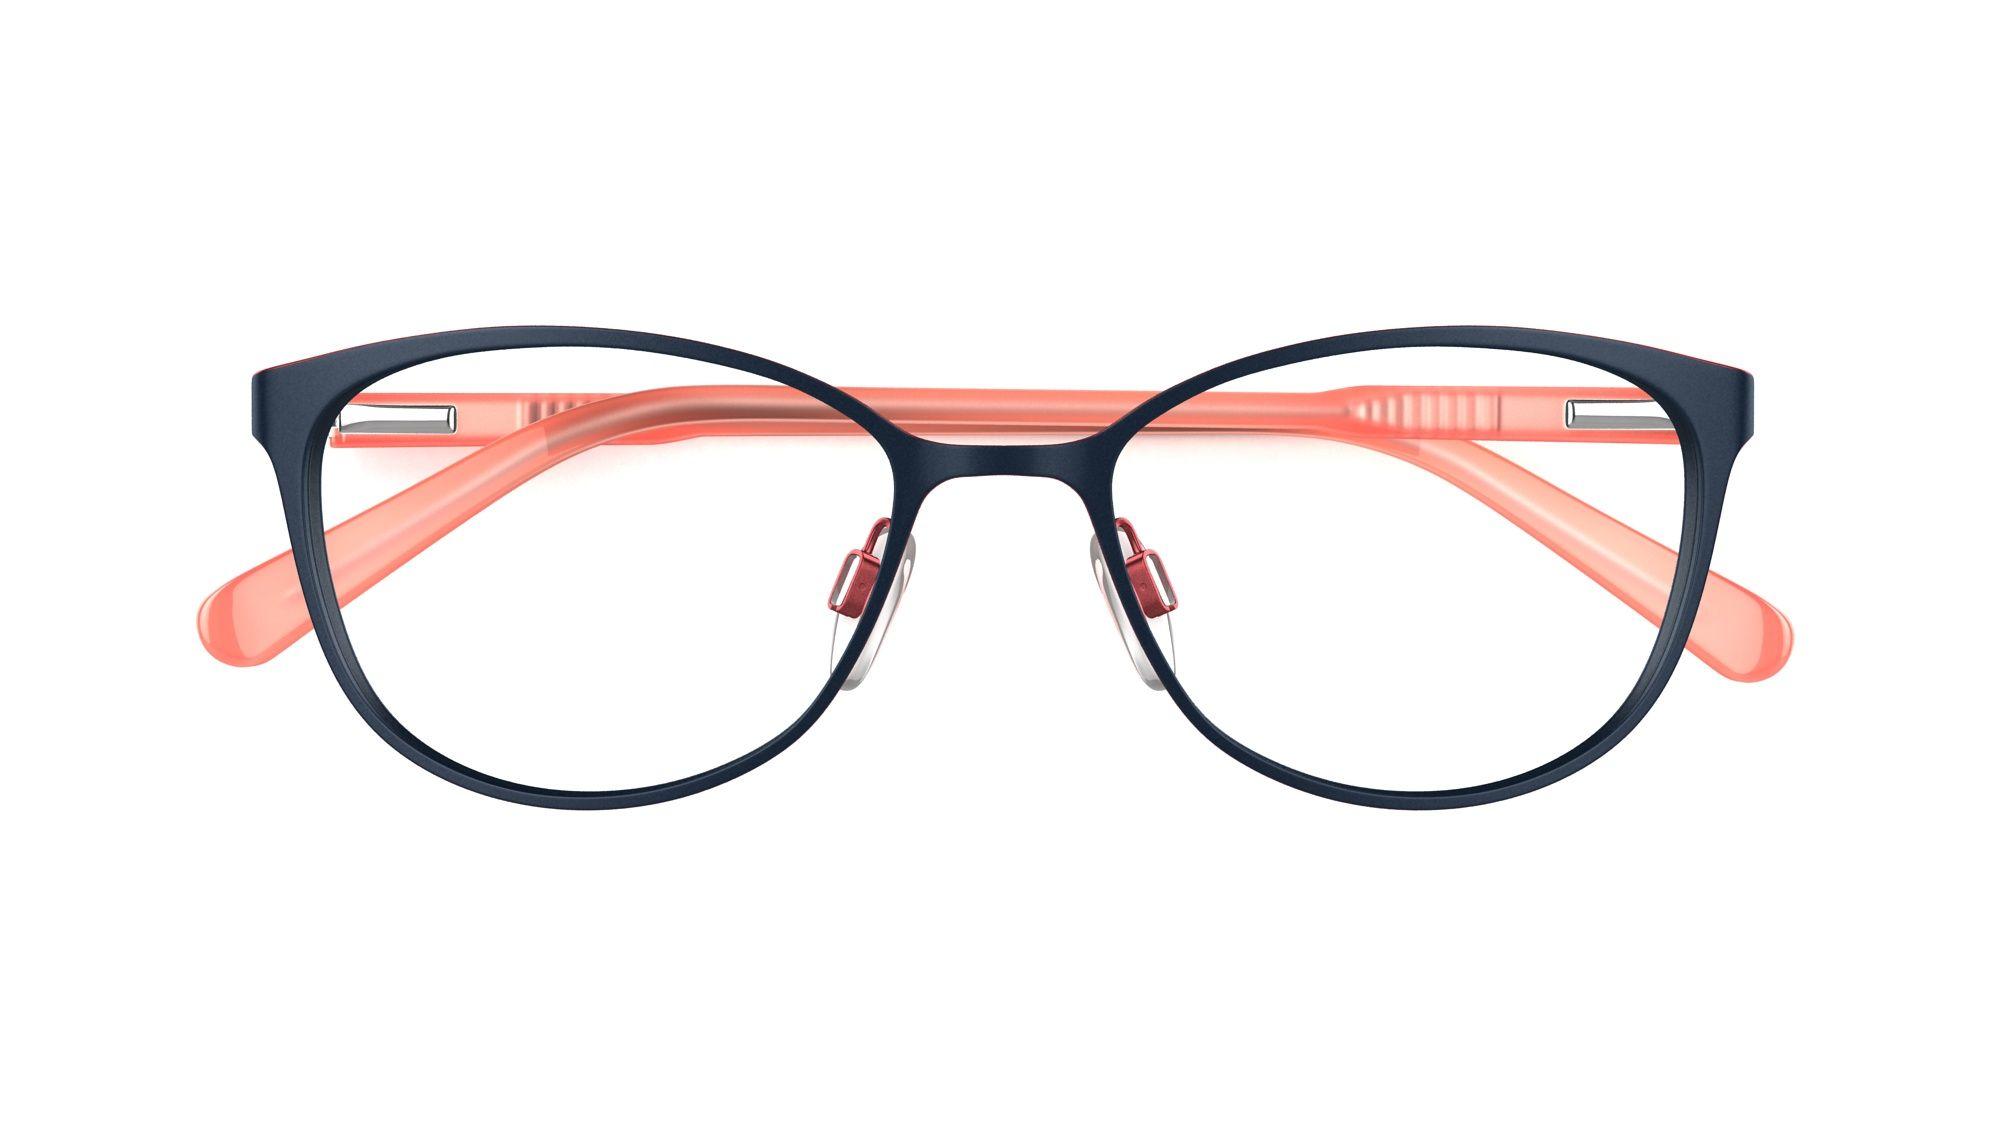 11300ba49e680 Tommy Hilfiger glasses - TH 84